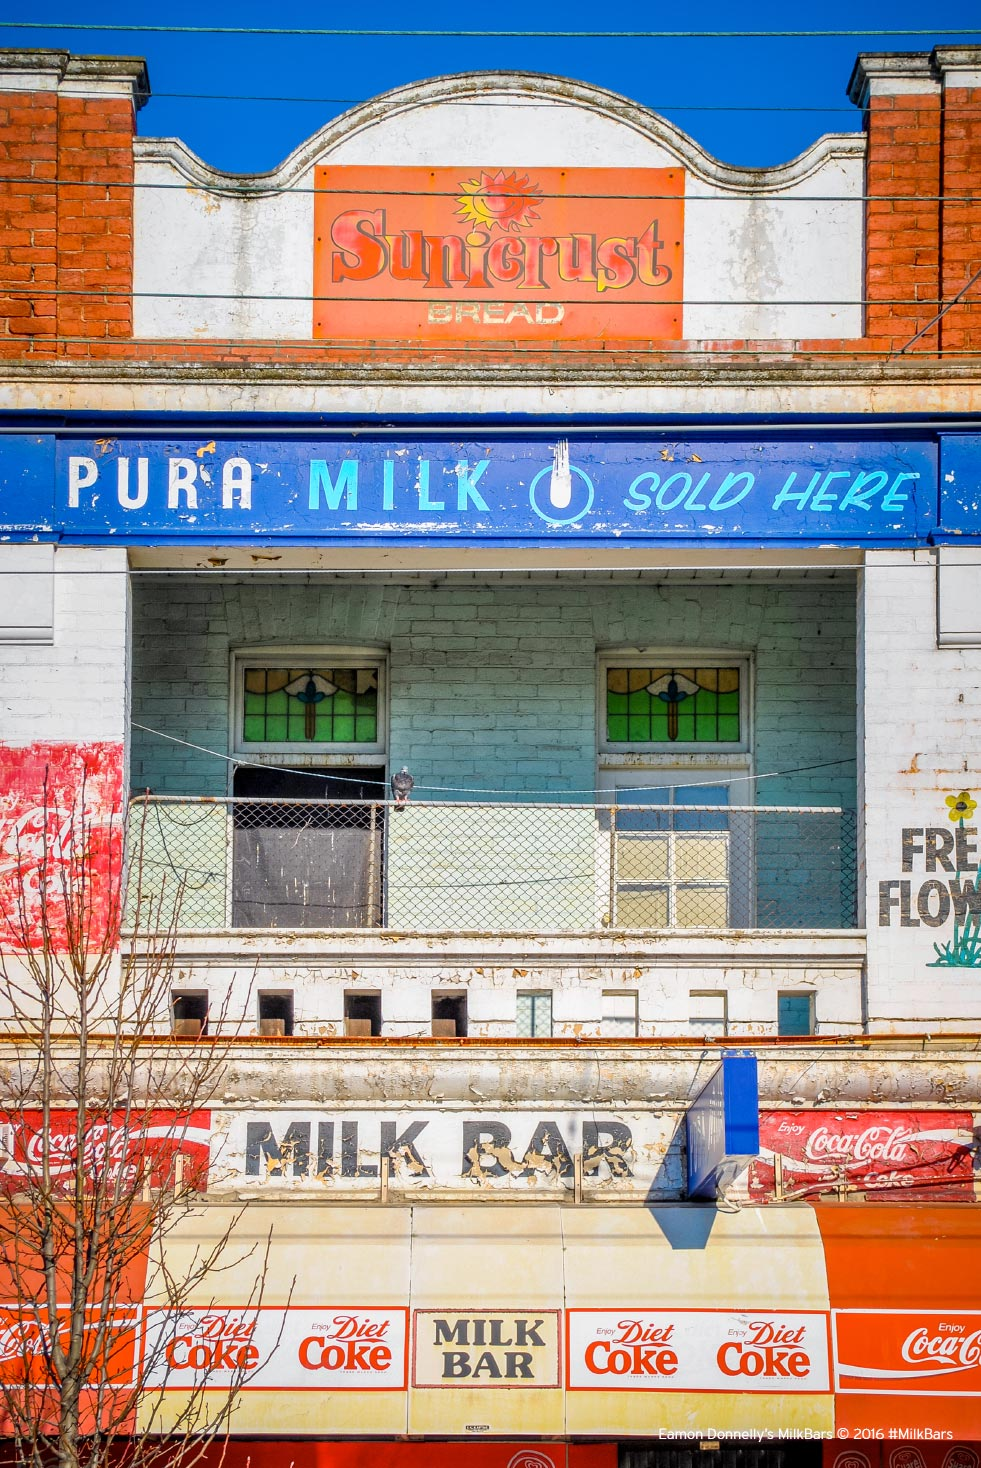 Brighton-Road-Milk-Bar-Eamon-Donnelly's-Milk-Bars-Book-Project-(c)-2001-2016.jpg